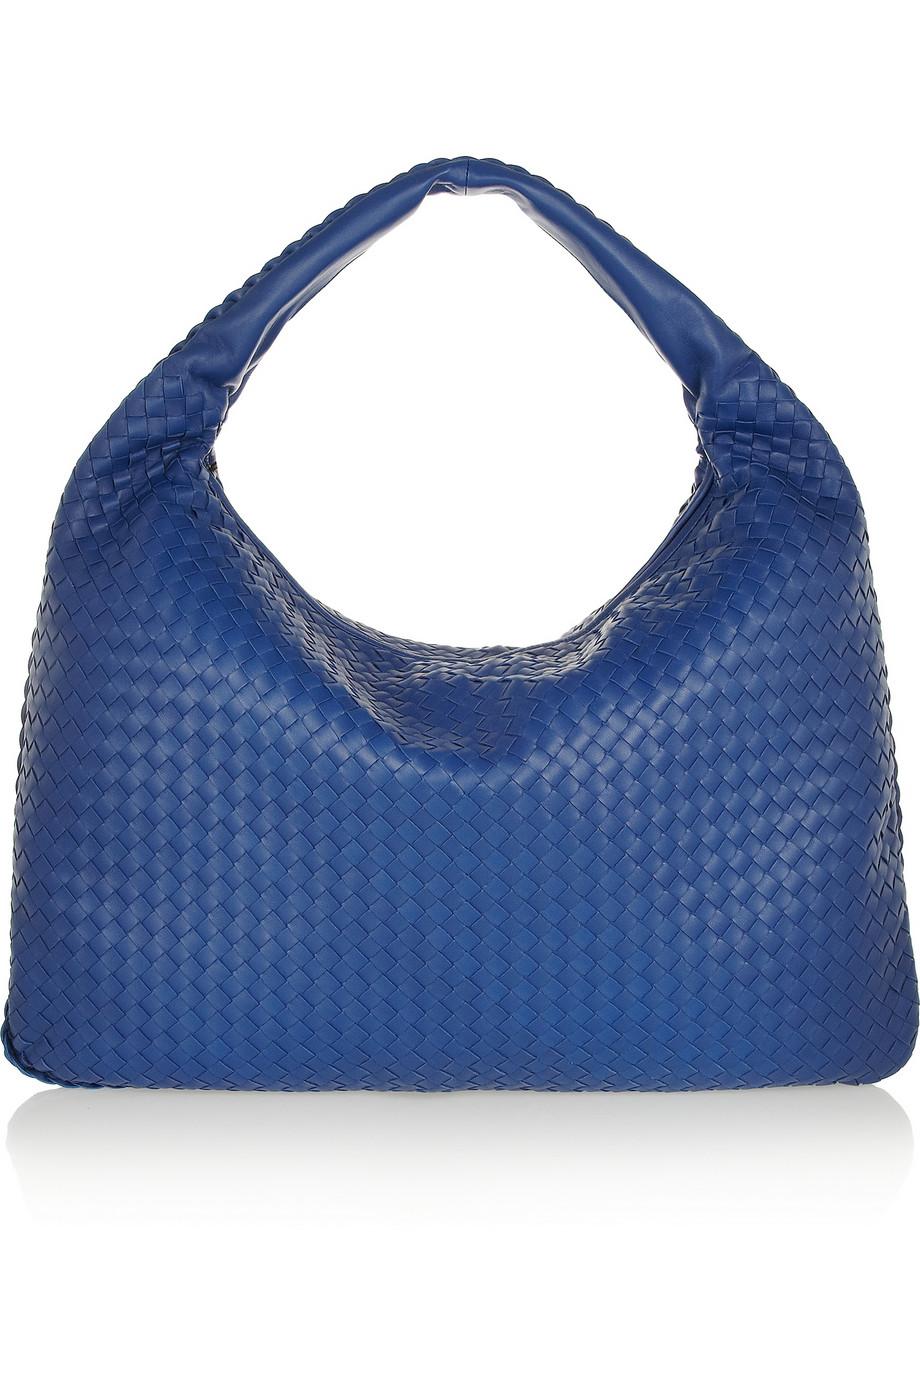 057cd9eff2 Lyst - Bottega Veneta Maxi Veneta Intrecciato Leather Shoulder Bag ...